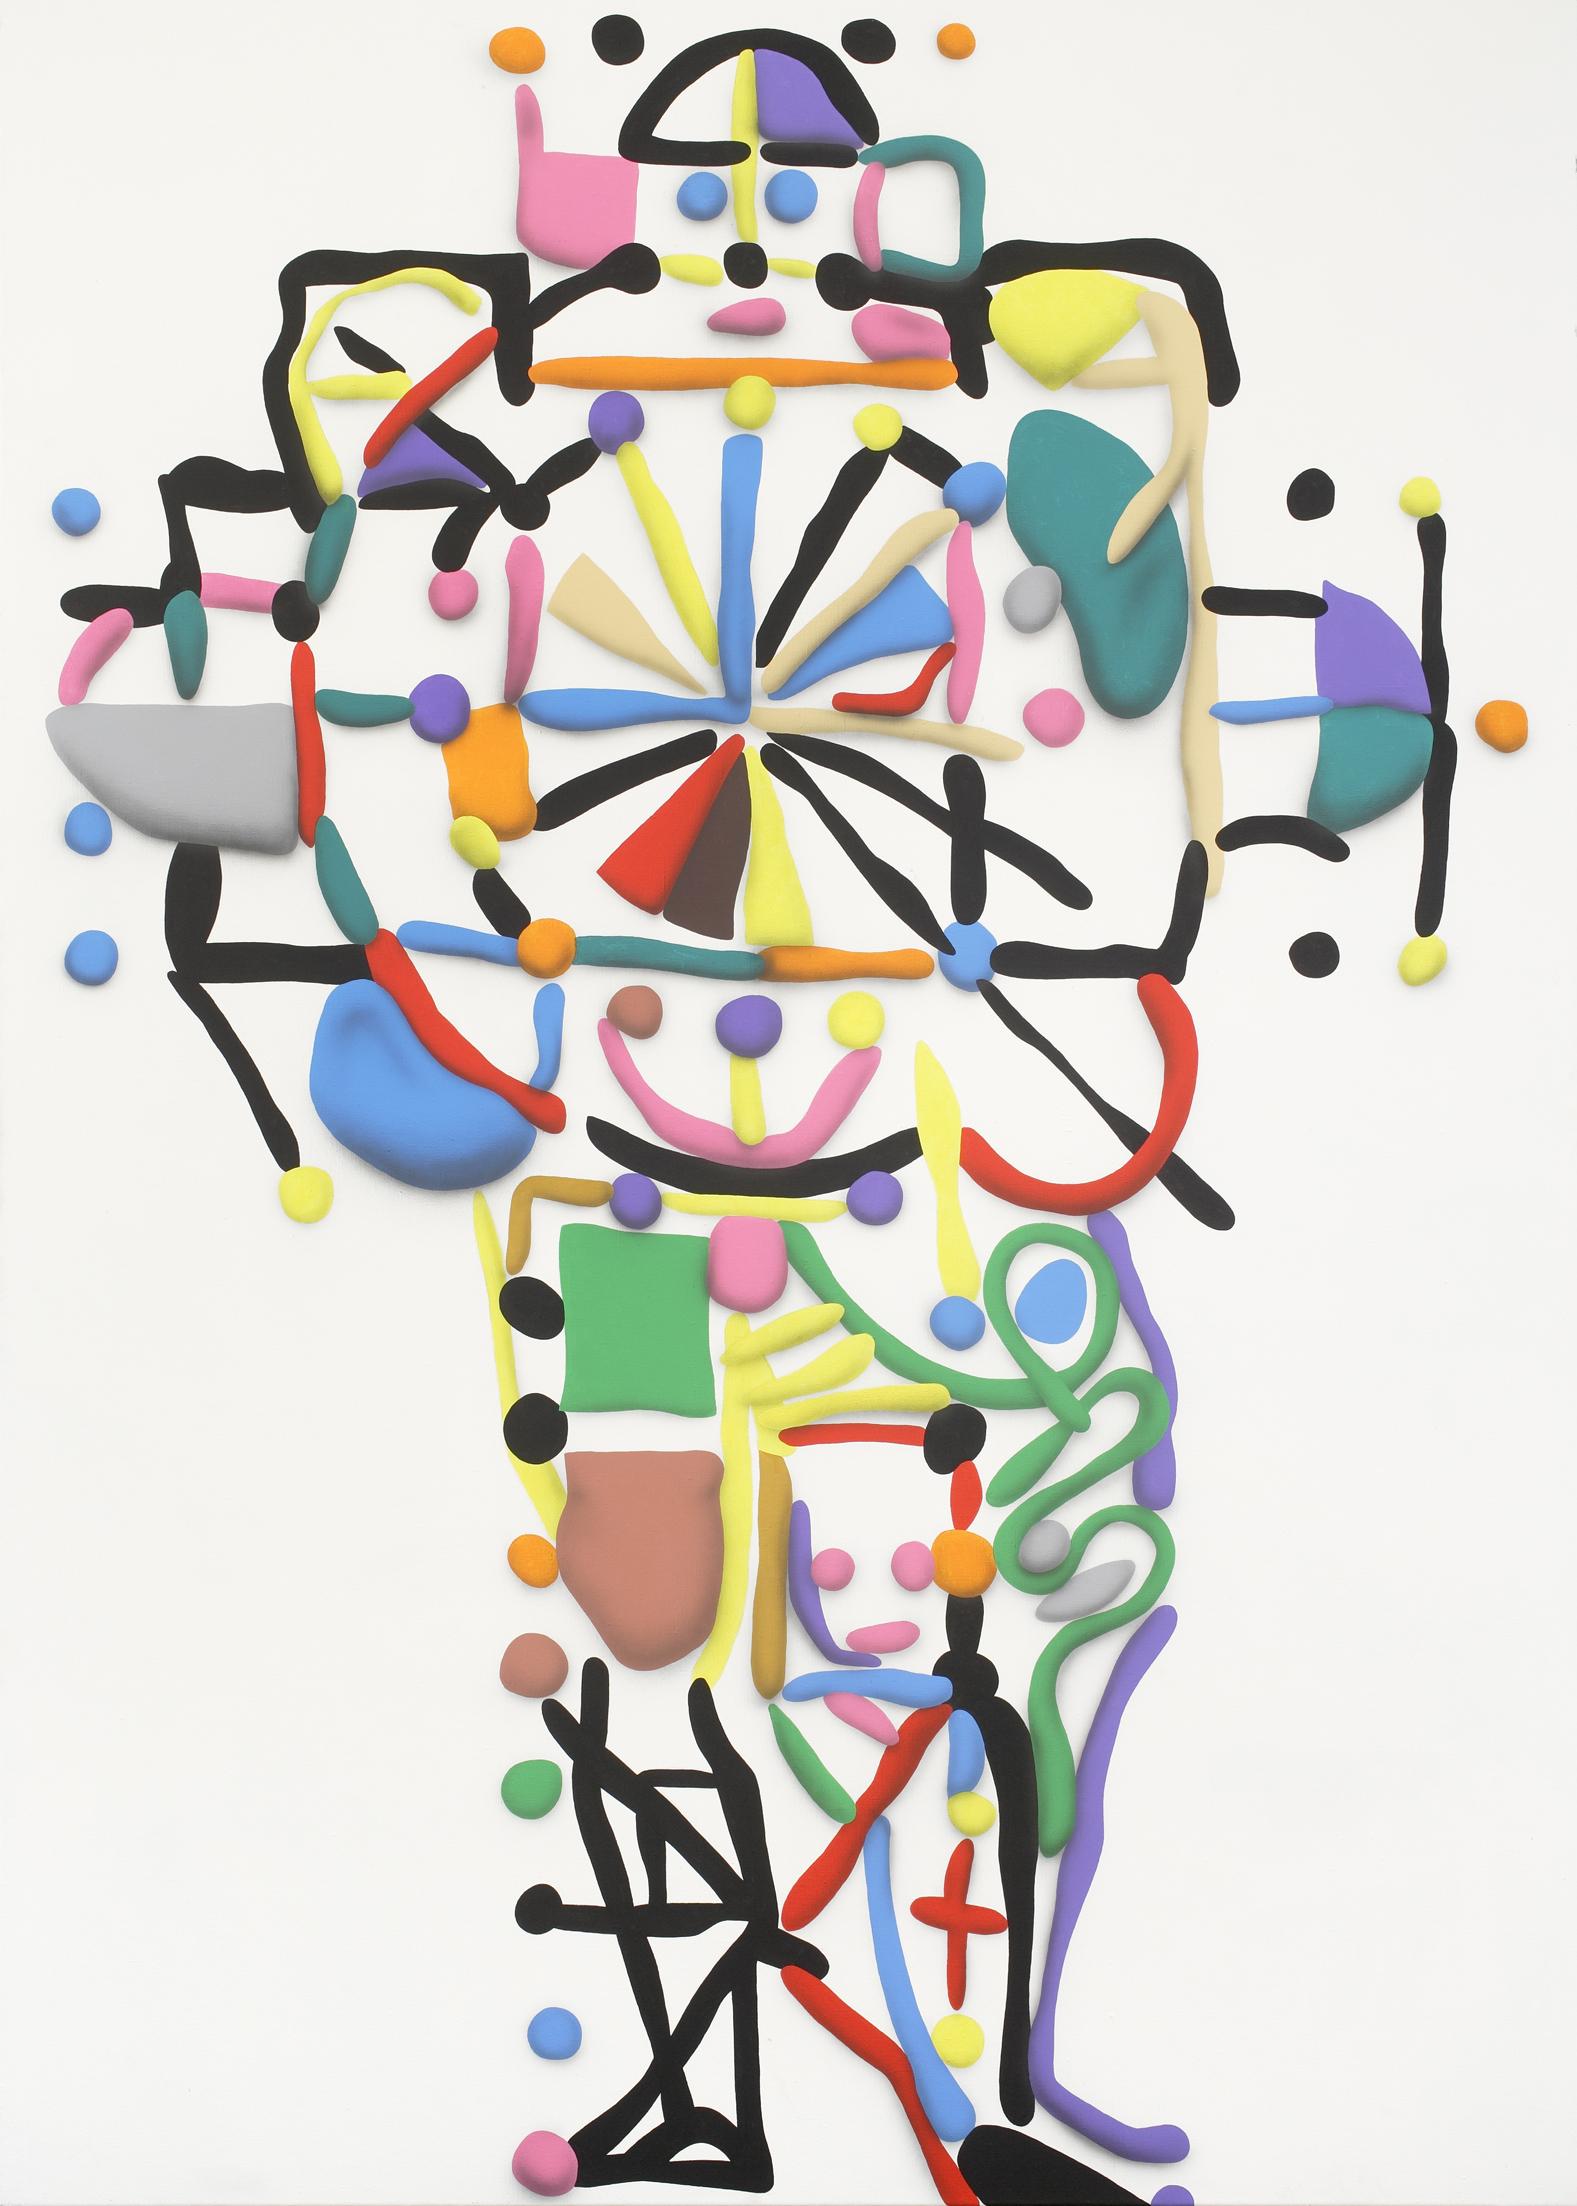 Man And The Cross, 2010, acrylic on canvas, 260 x 185 cm